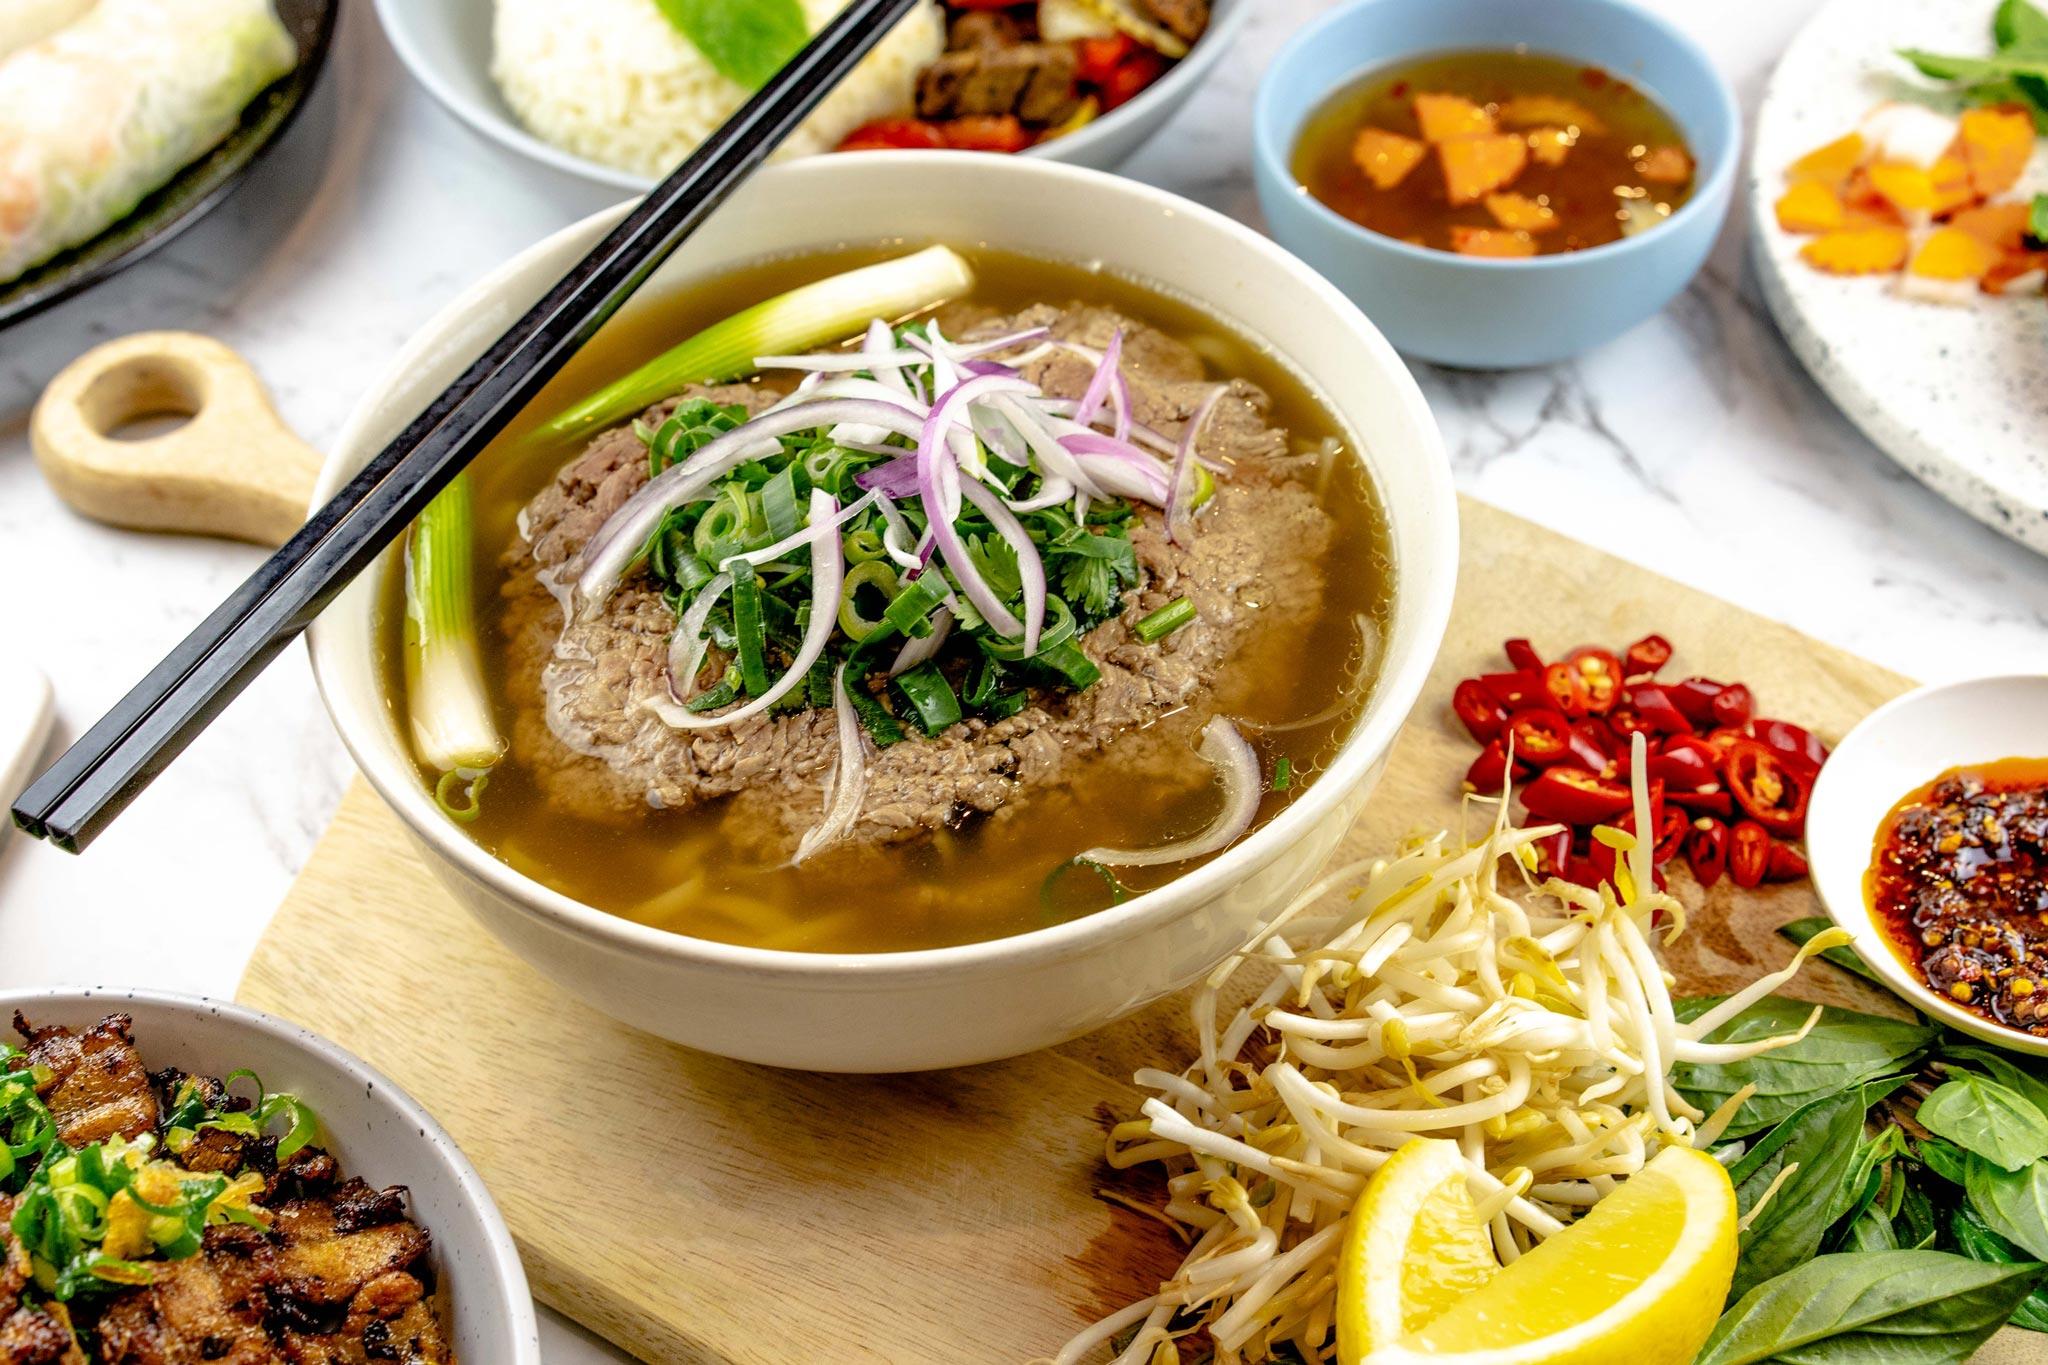 PhoMeOi_FoodImages-7.jpg